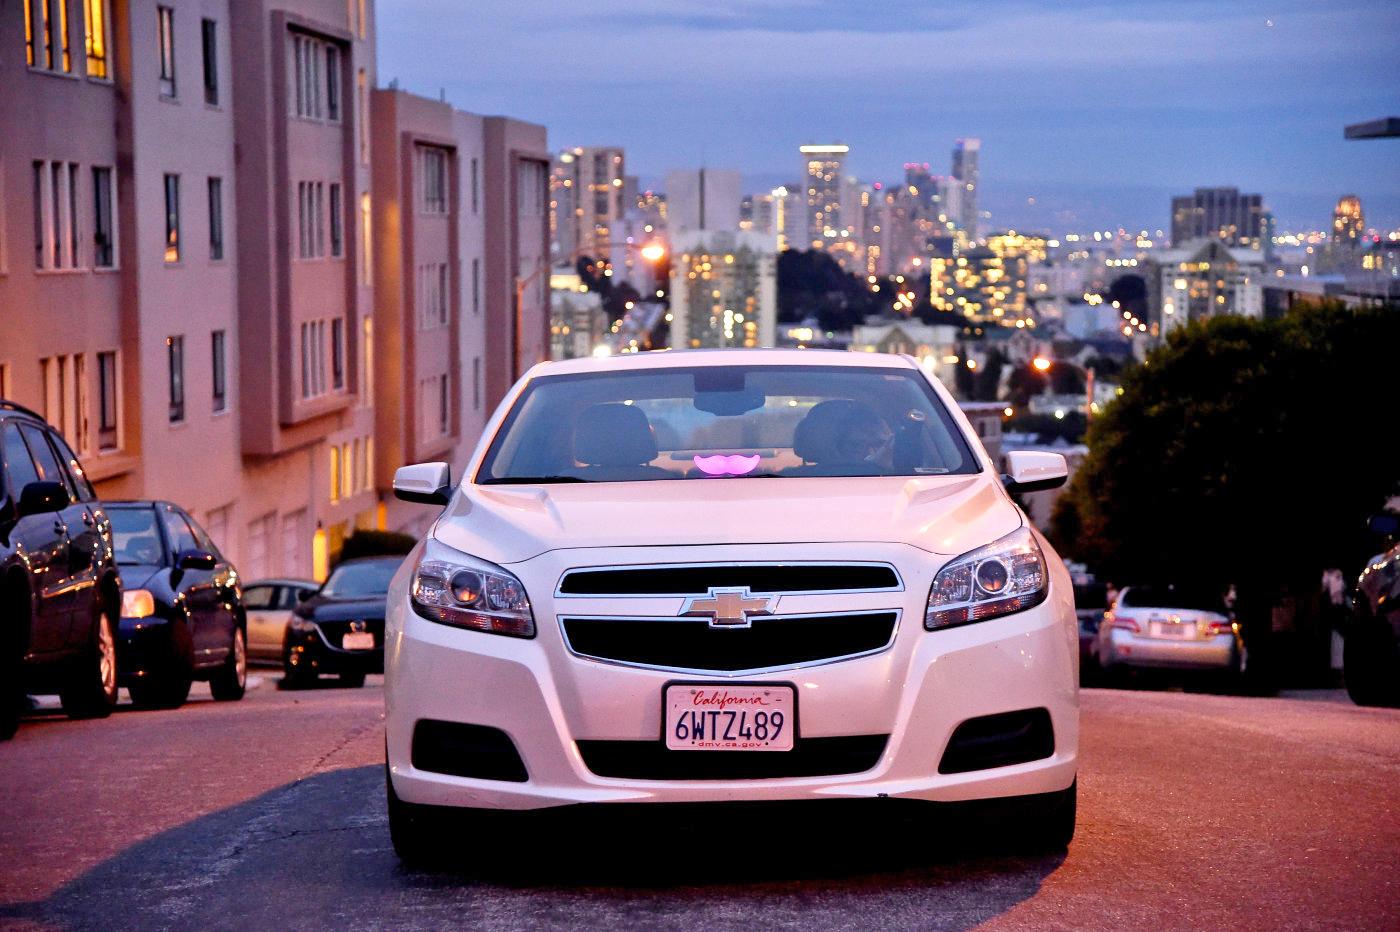 Lyft wants you to hail rides through Facebook Messenger